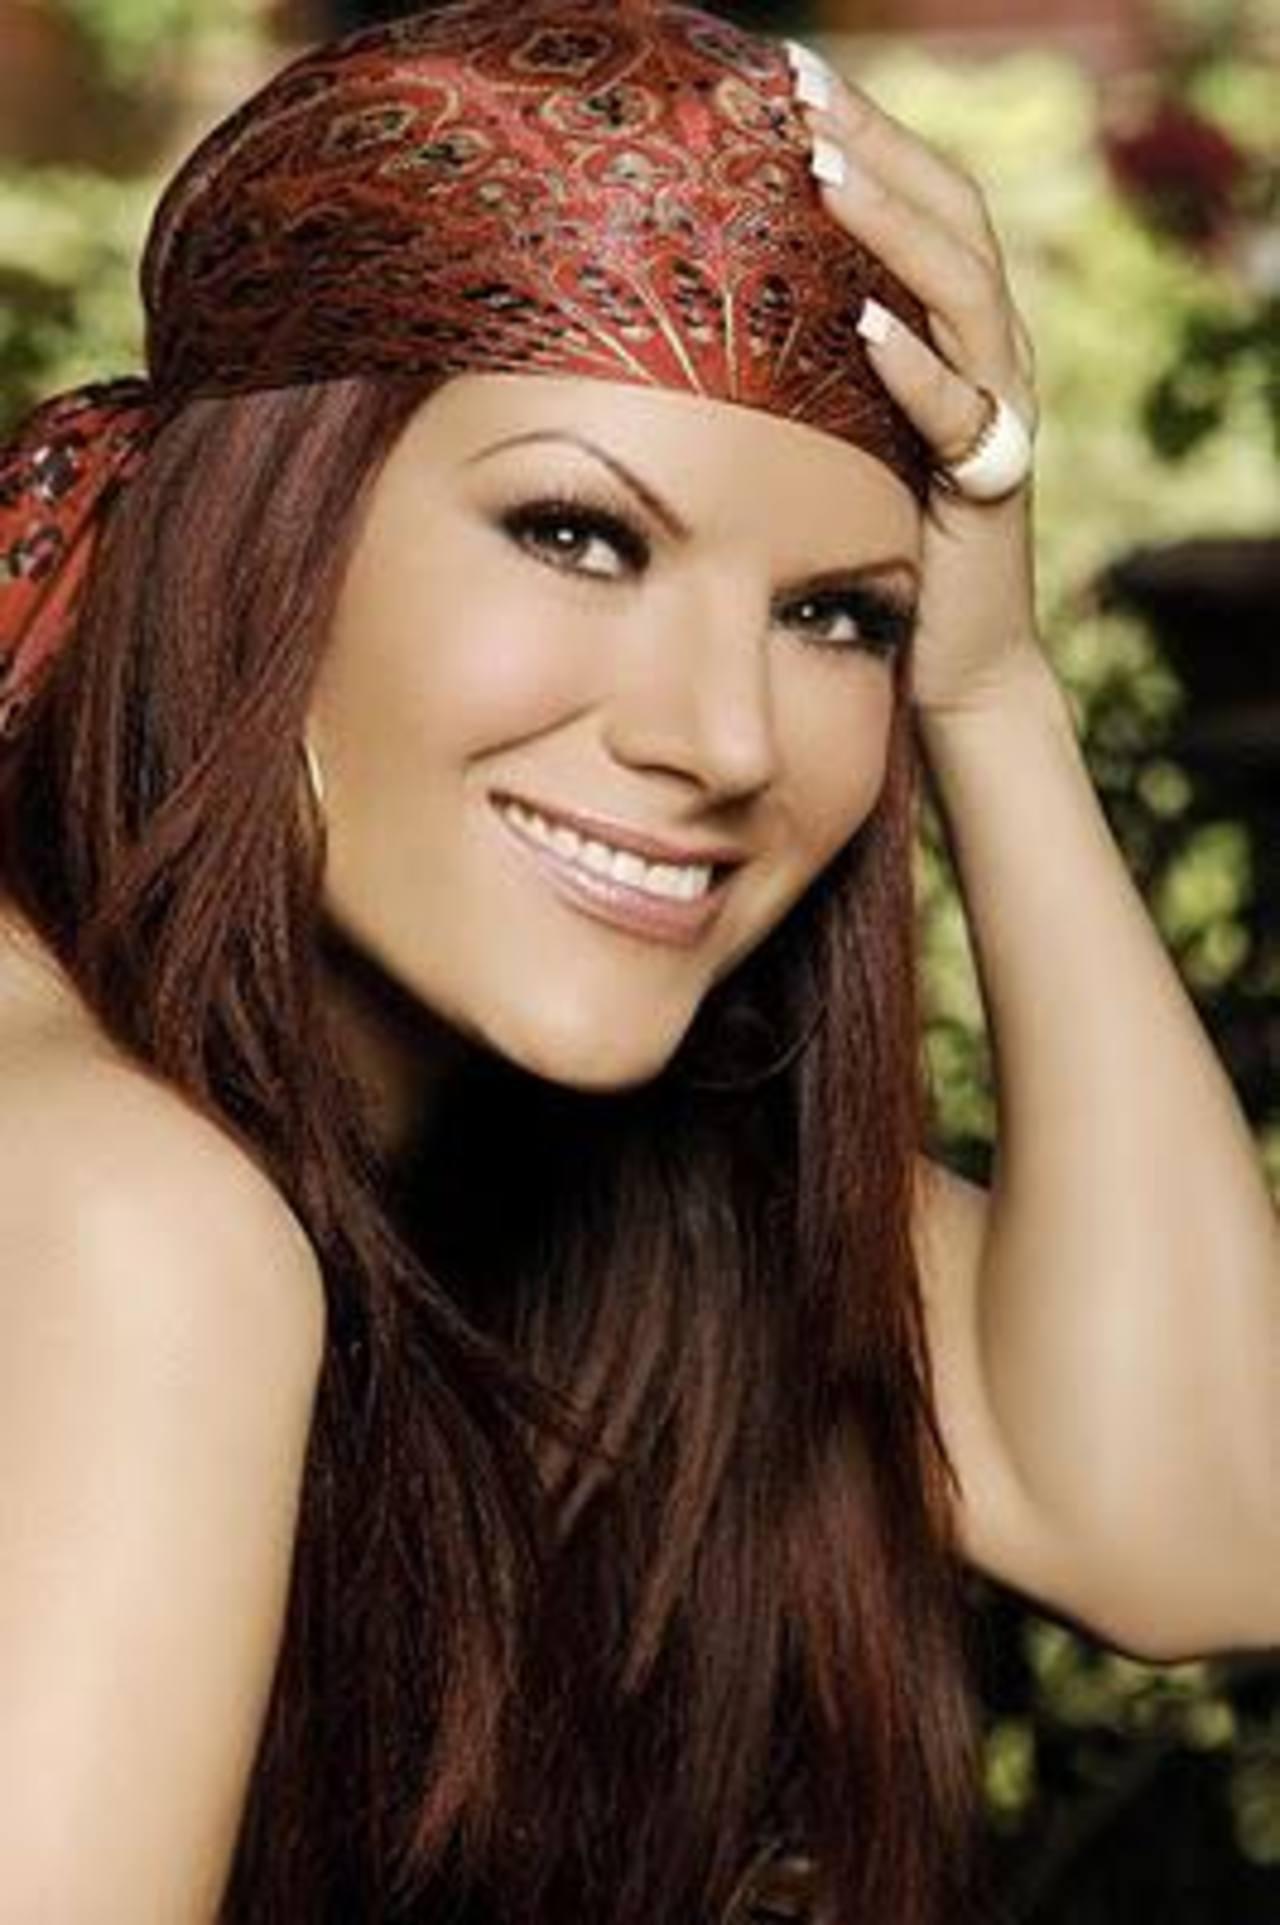 La cantante mexicana aclara que en ningún momento ha pretendido ocupar el lugar de Jenni Rivera. Foto EDH / Internet